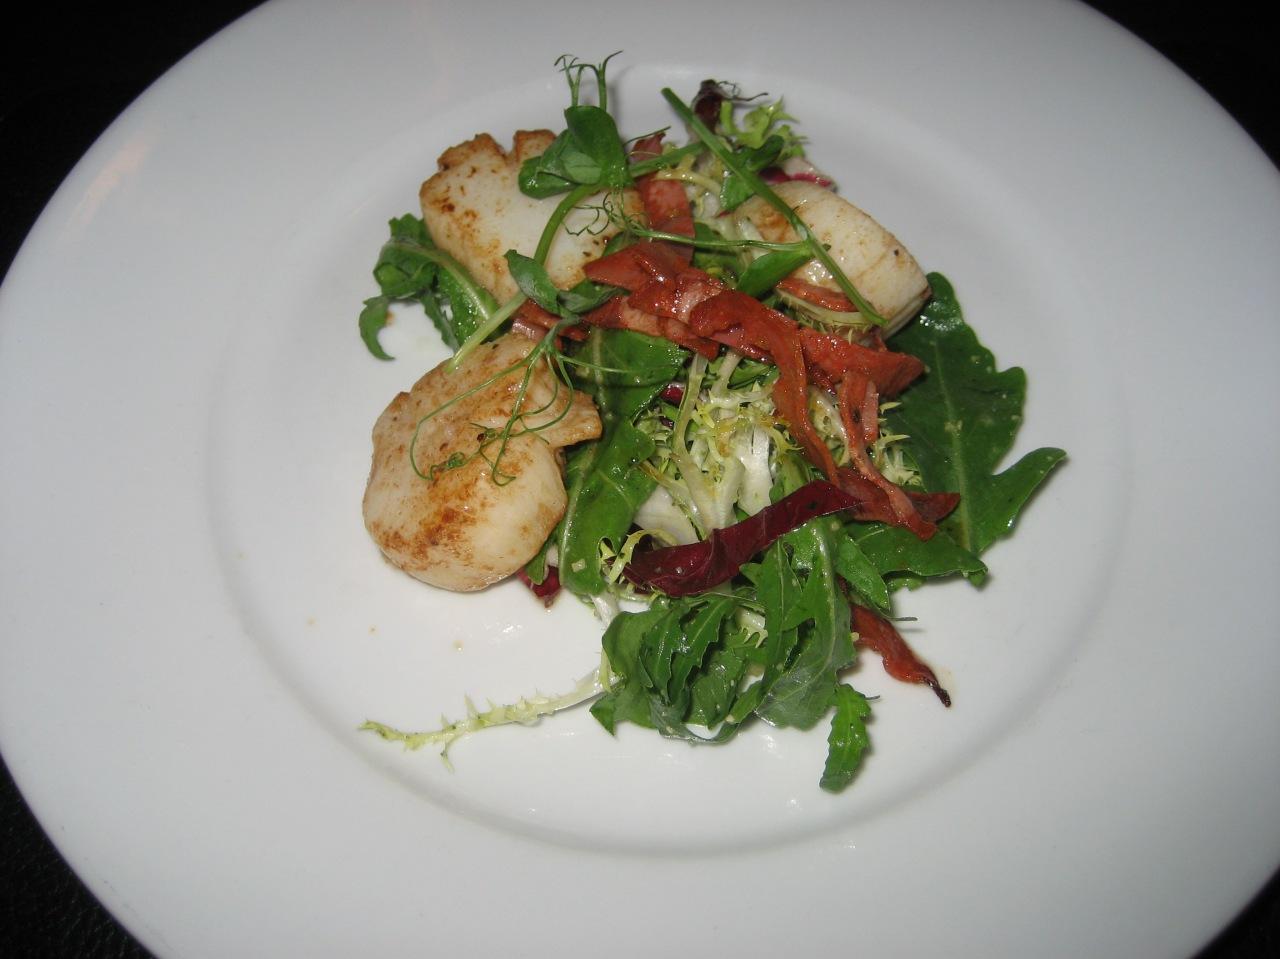 the-countryman-pan-seared-scallops-with-pesto-and-chorizo-salad-003_36846750272_o